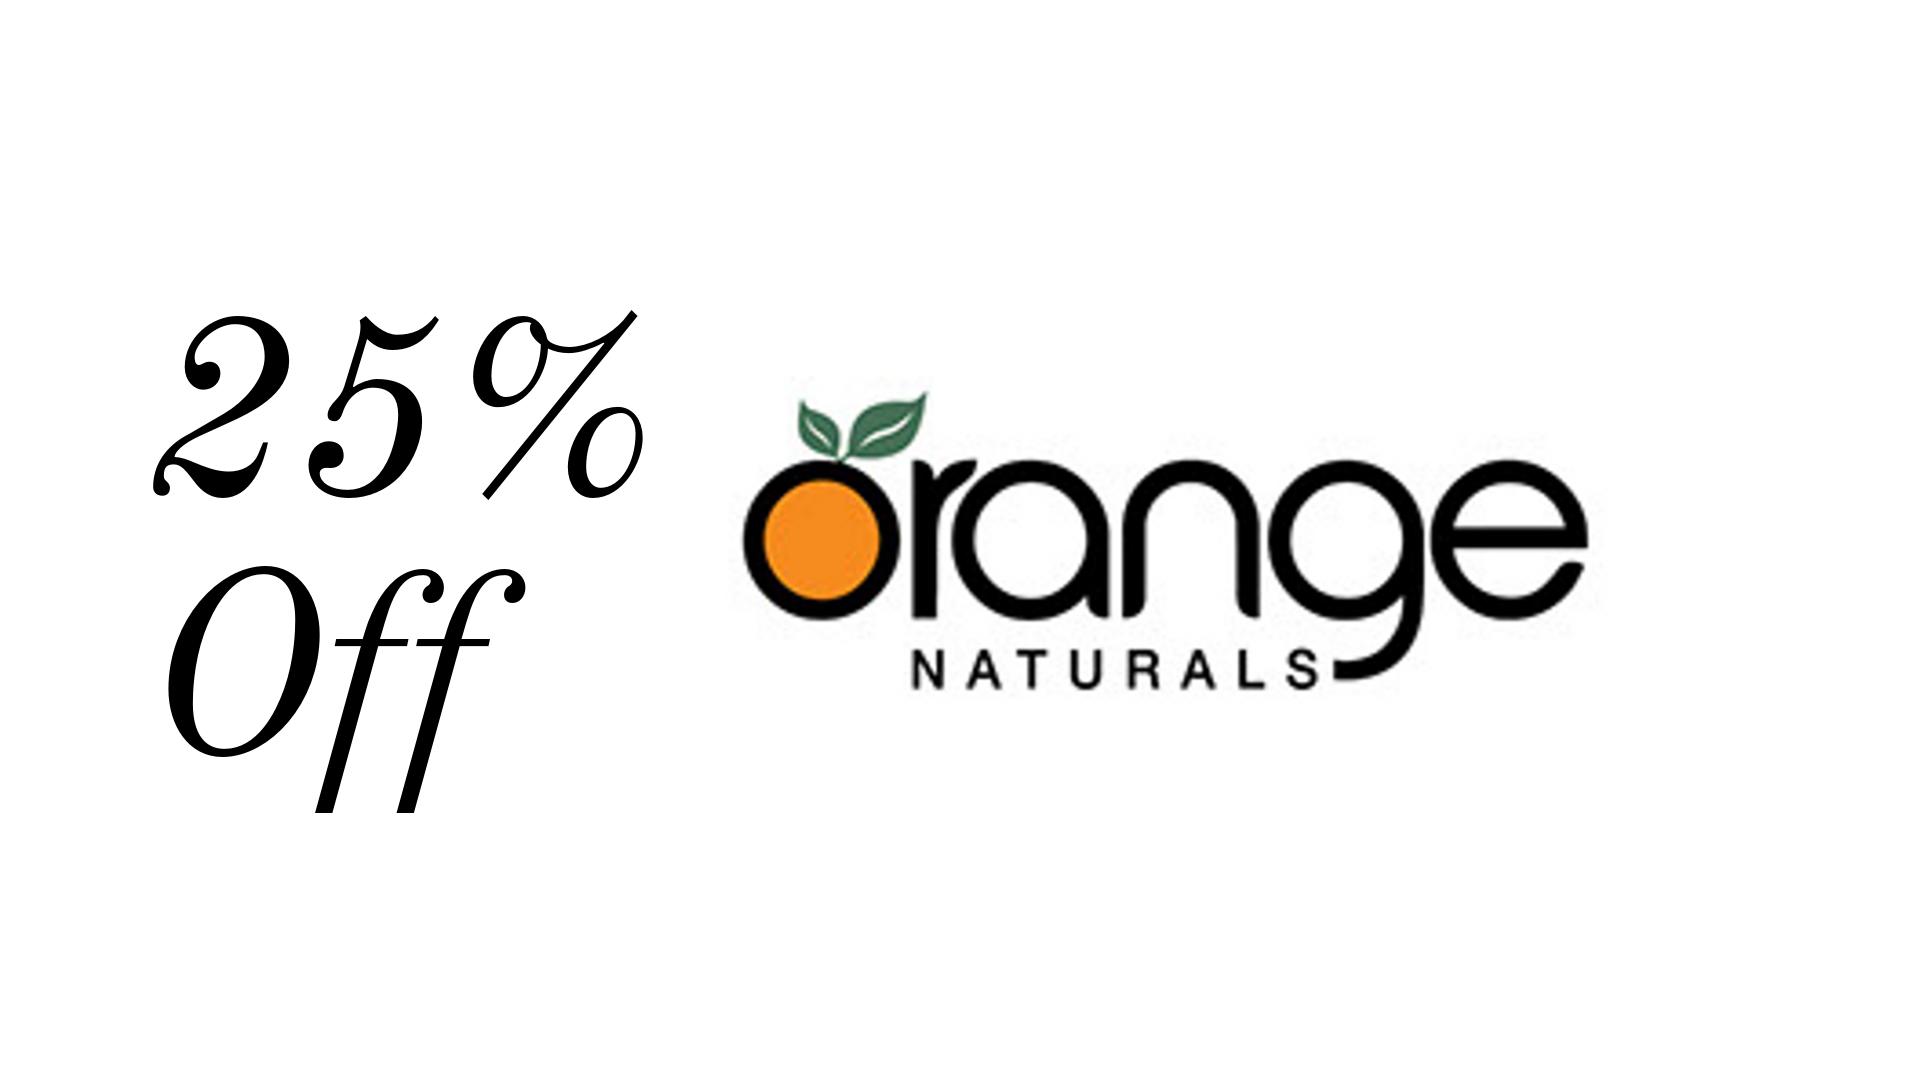 orange-naturals-1920-x-1080-px.png